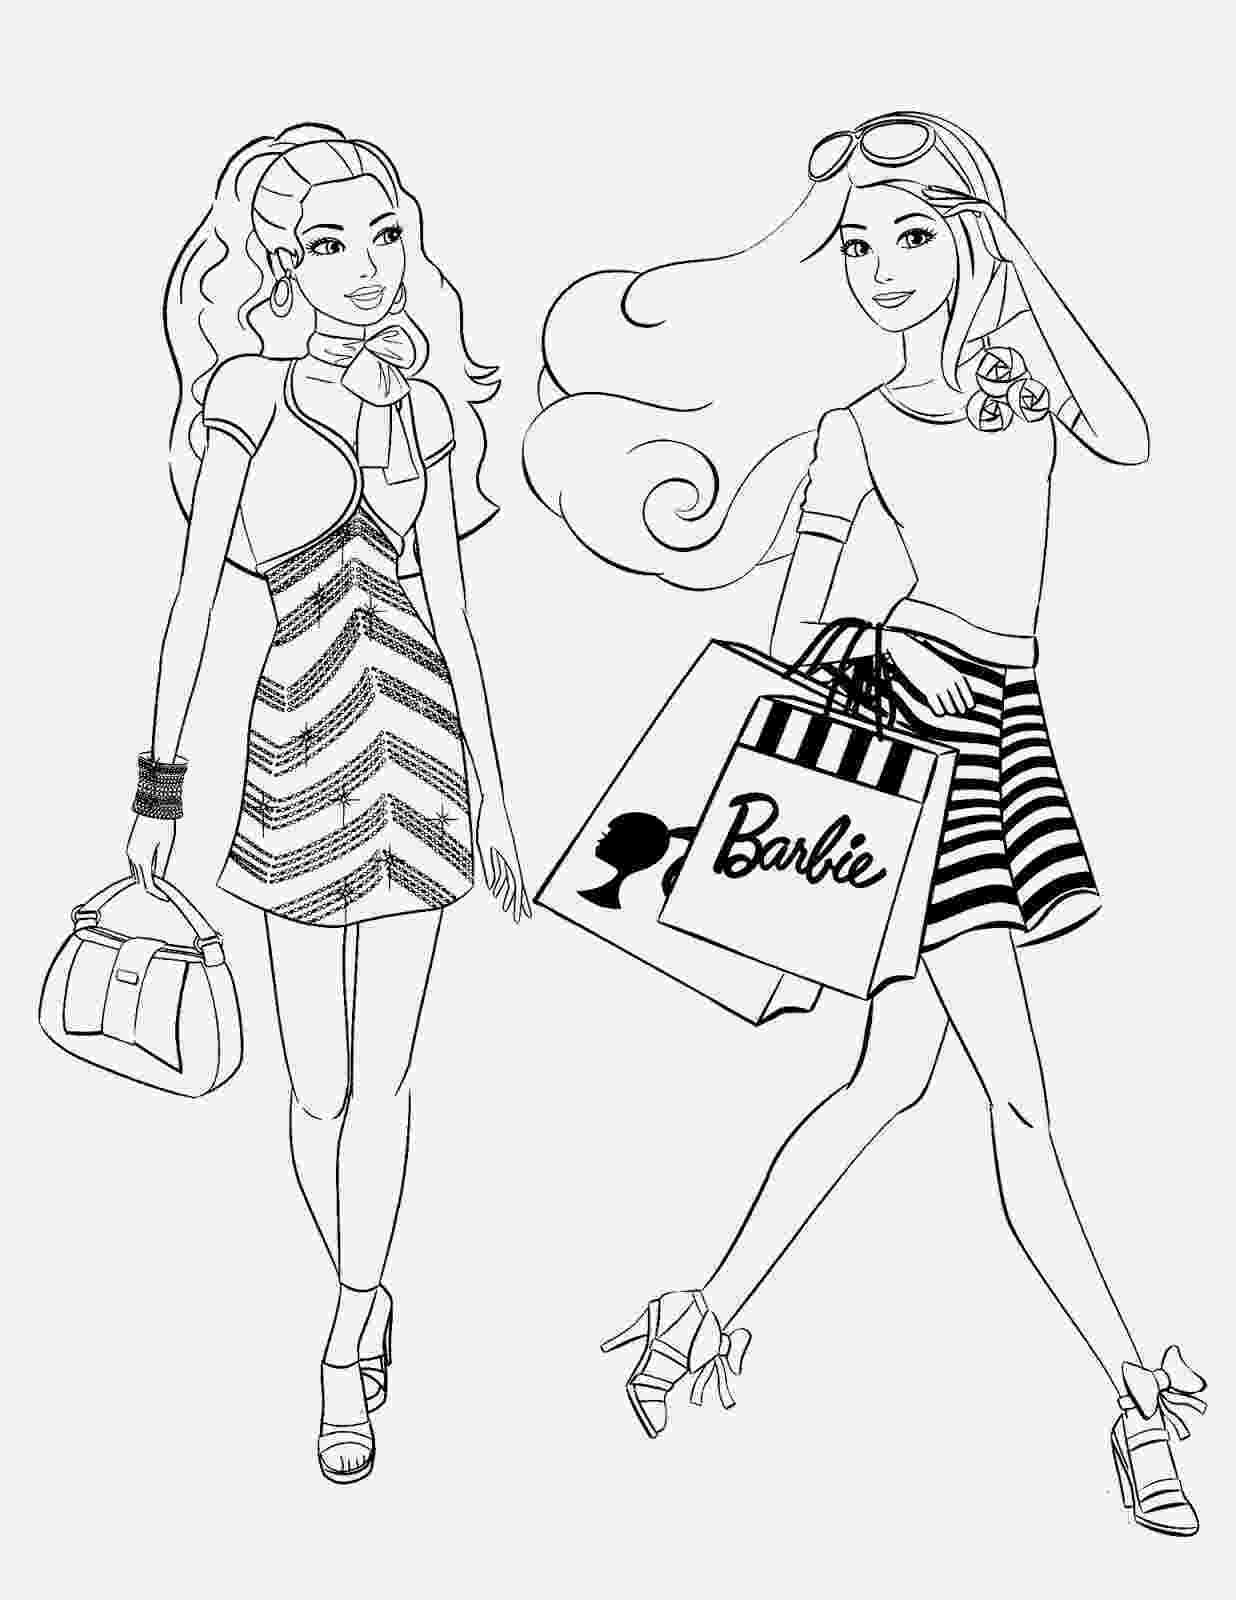 coloring pages of barbie اشواق وحنين صور باربى بجودة عالية مرسومة وجاهزة للتلوين pages coloring barbie of